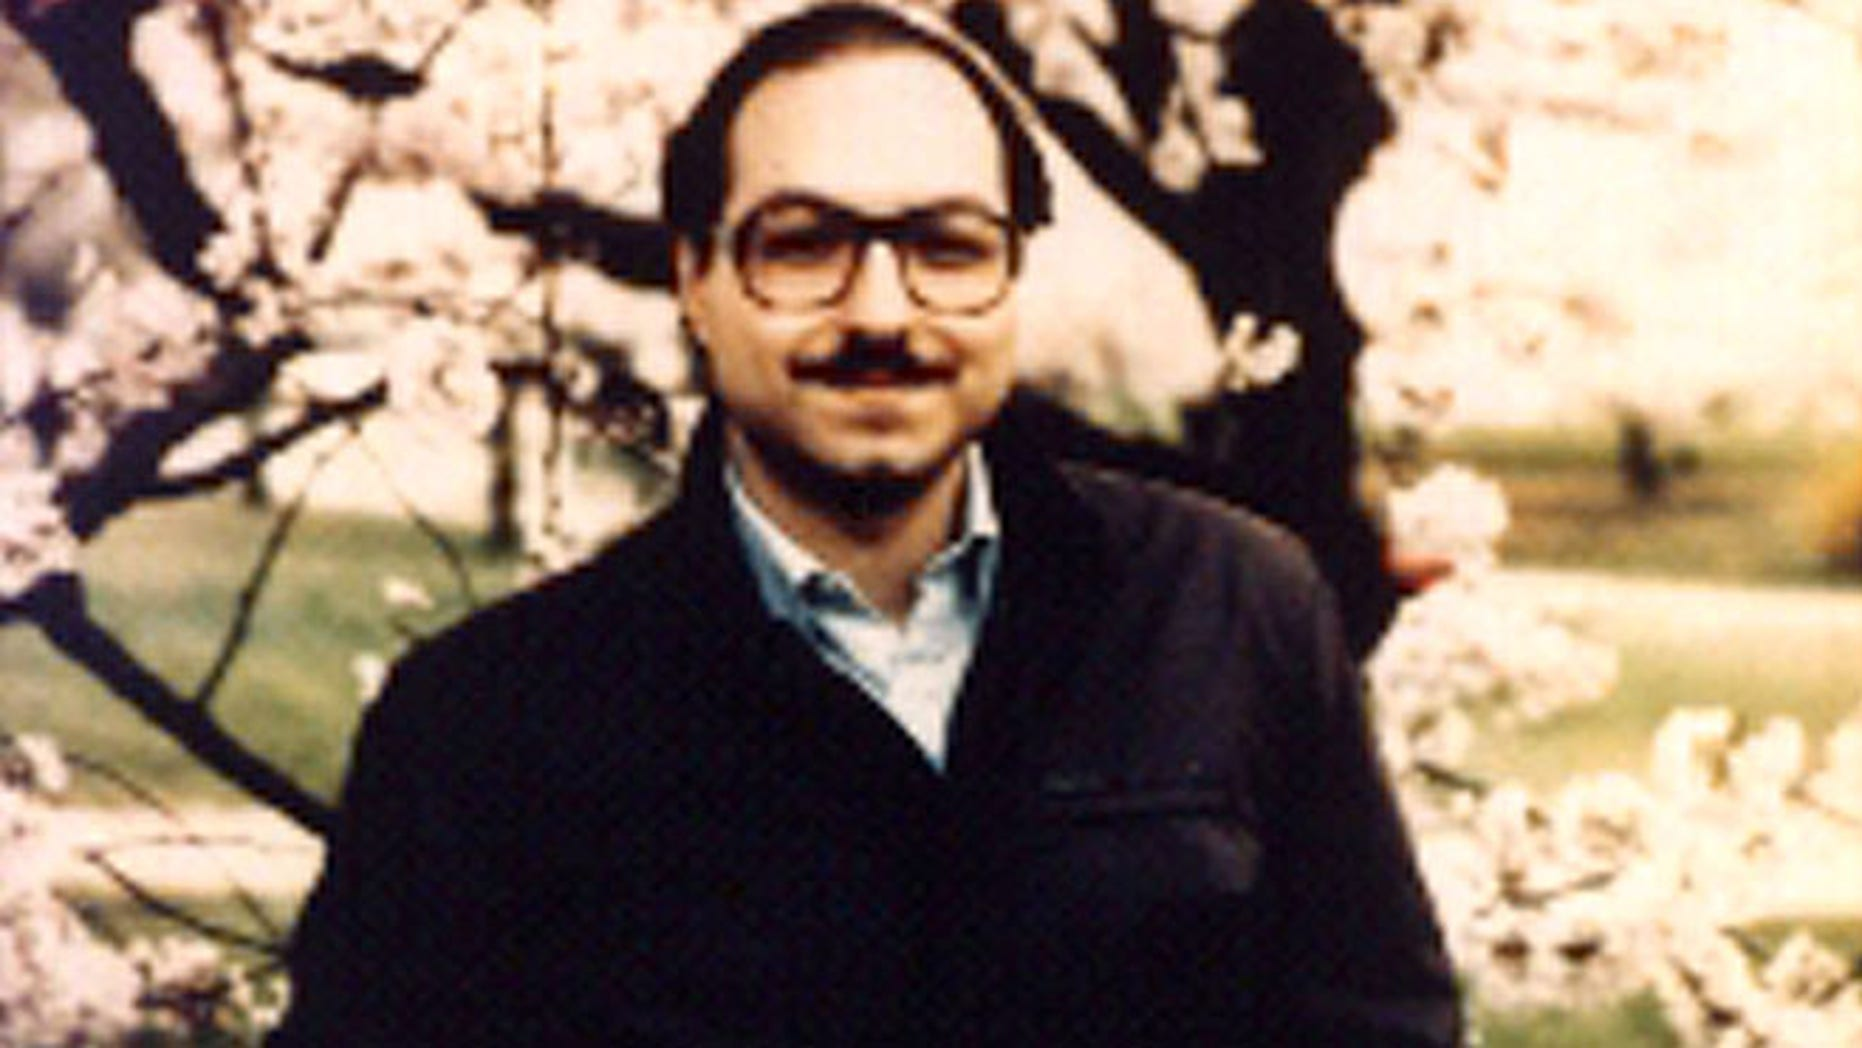 Undated photo of Jonathan Pollard prior to his arrest.